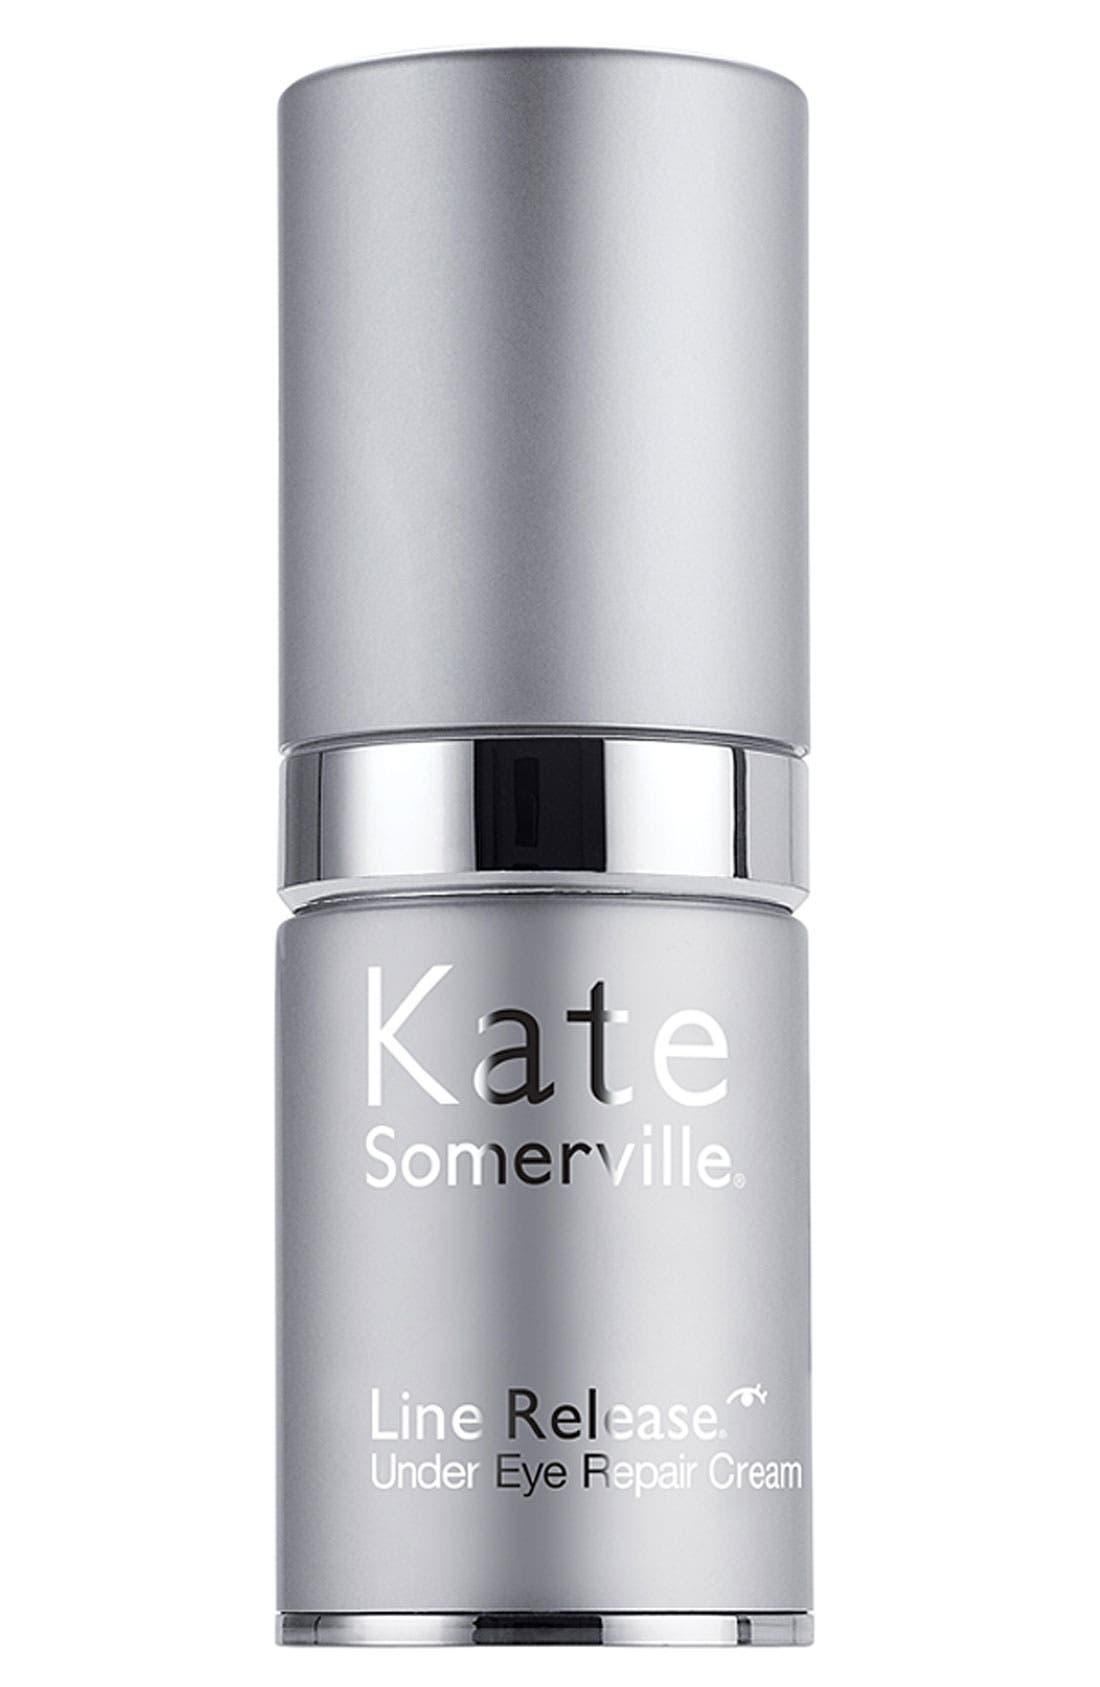 Kate Somerville® 'Line Release' Under Eye Repair